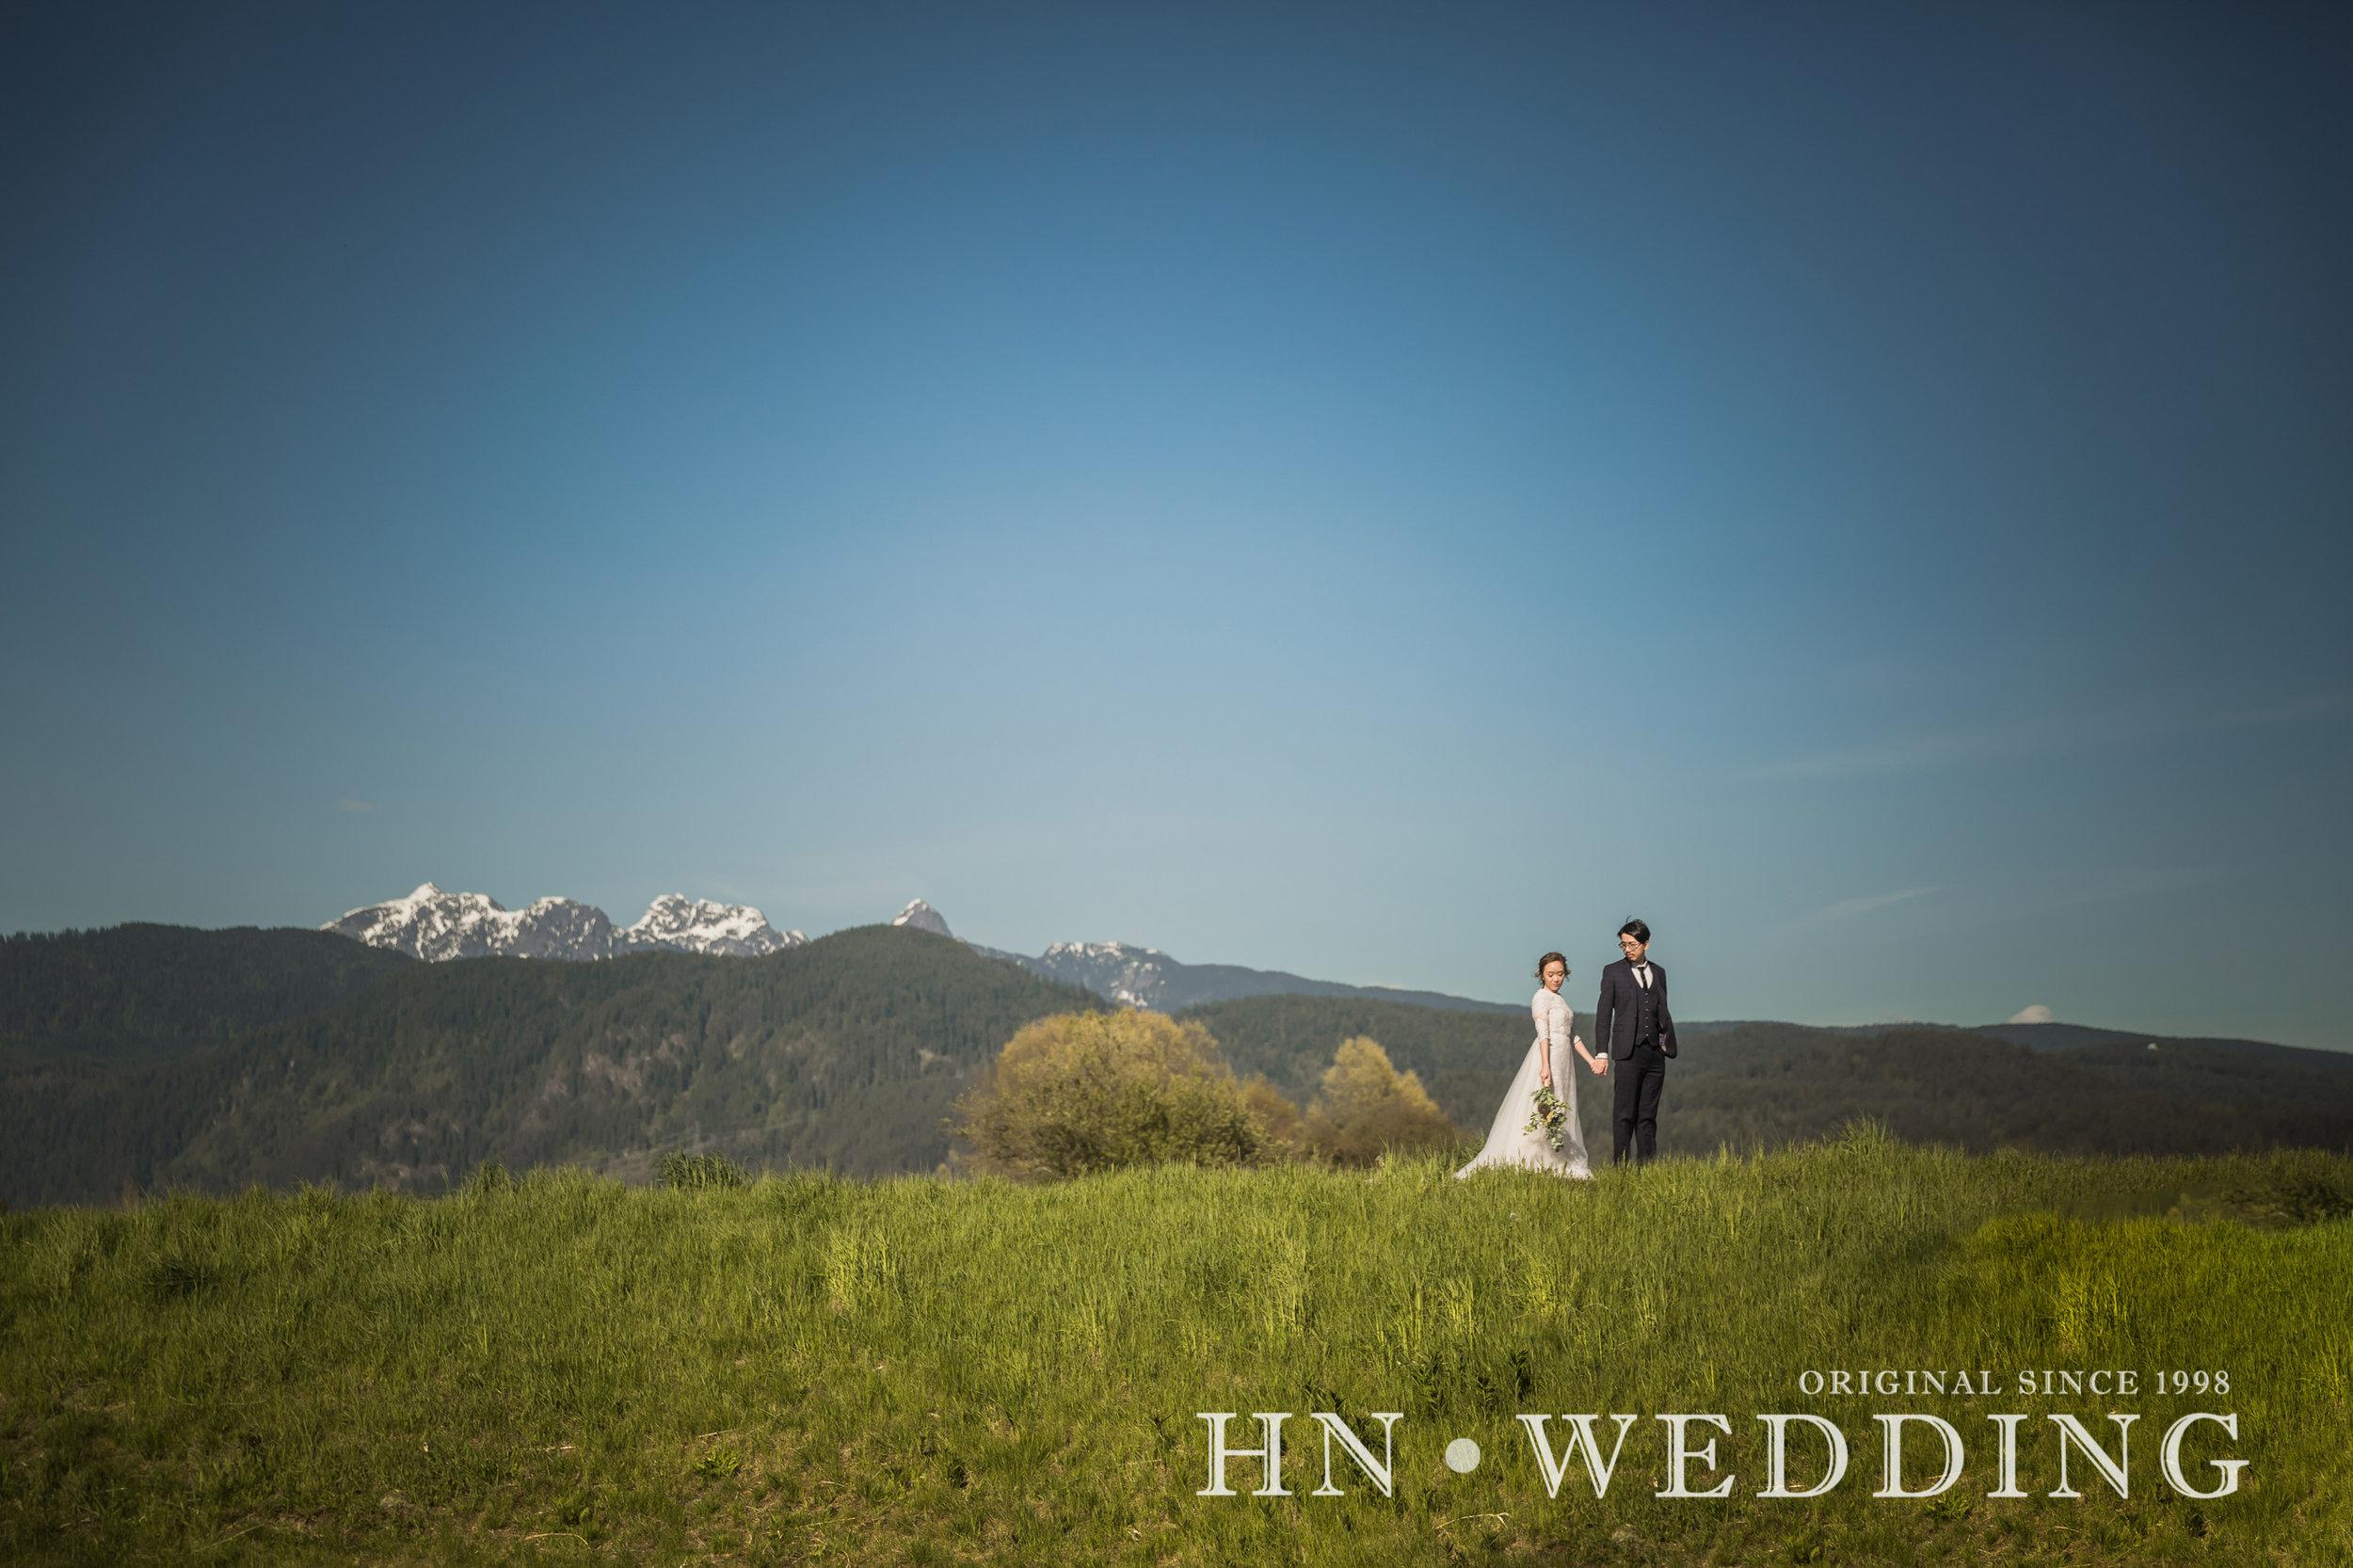 hnweddingweddingdayA&R-28.jpg